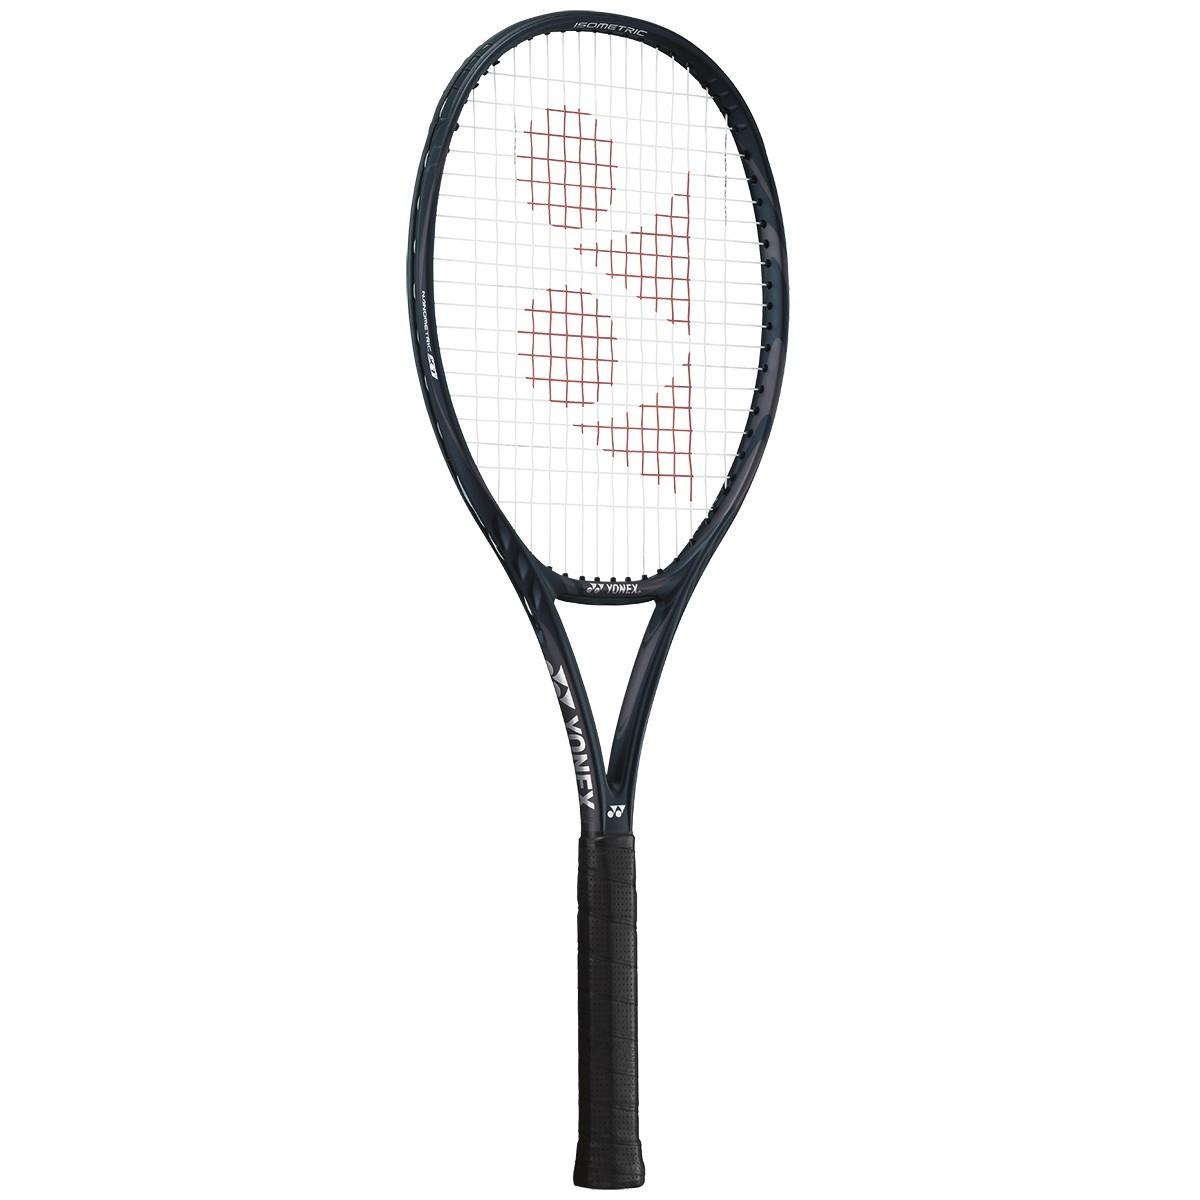 Rakieta tenisowa Yonex VCORE 98 Galaxy Black (305g) + naciąg